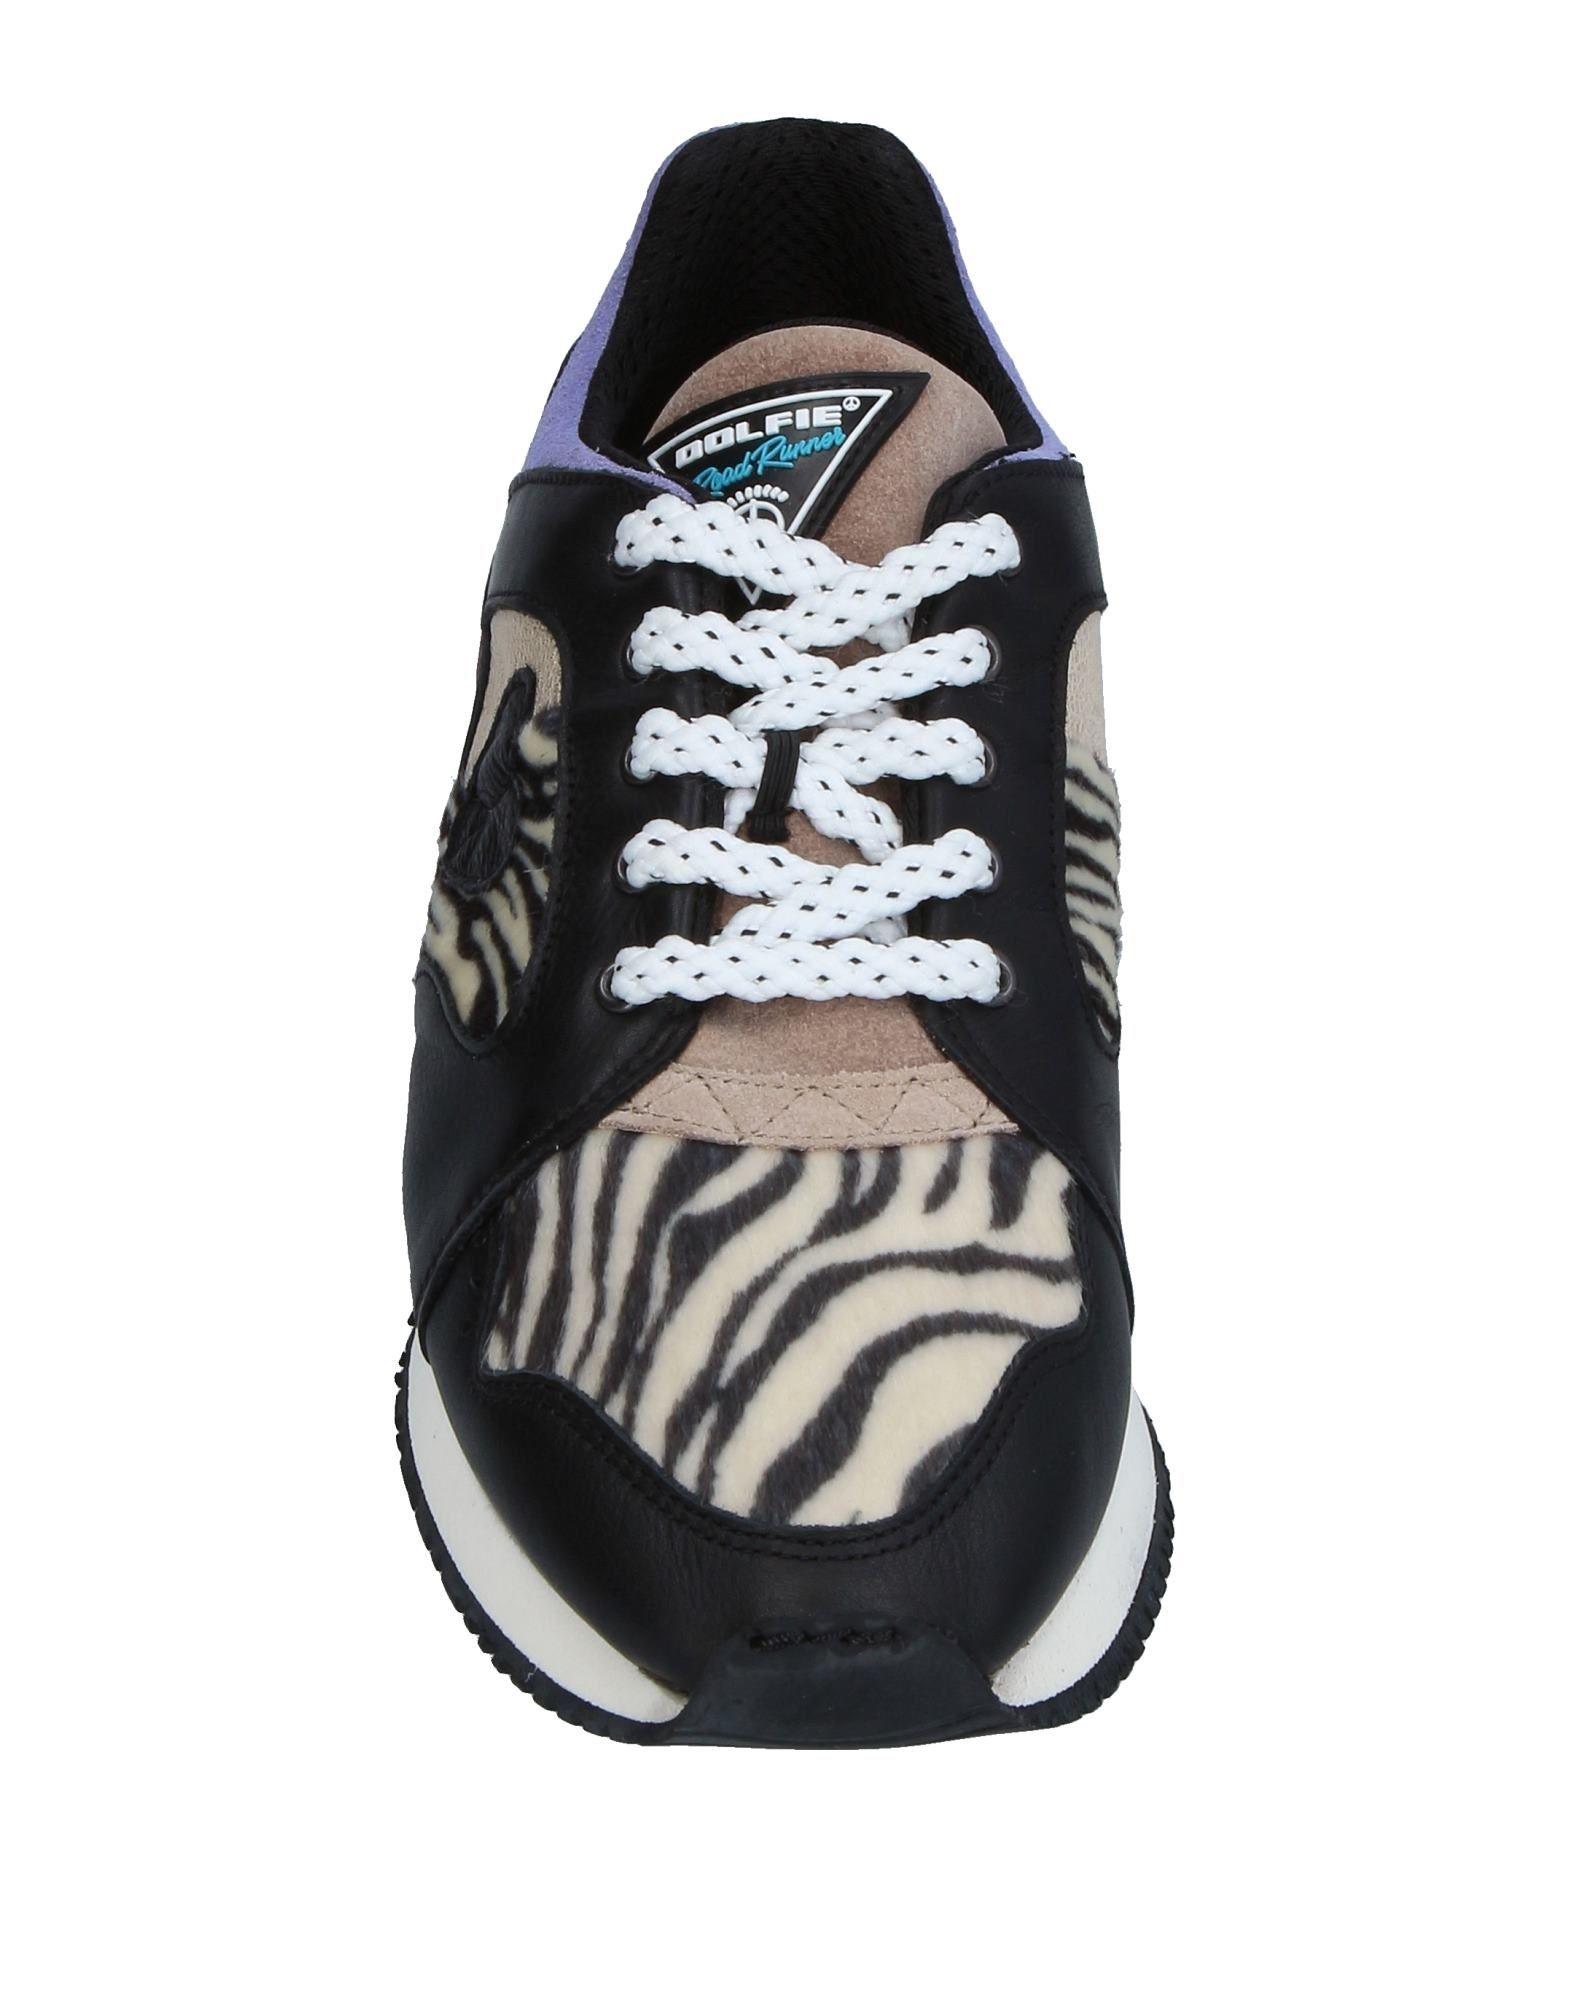 Dolfie Sneakers Damen beliebte  11279161WB Gute Qualität beliebte Damen Schuhe b0347b